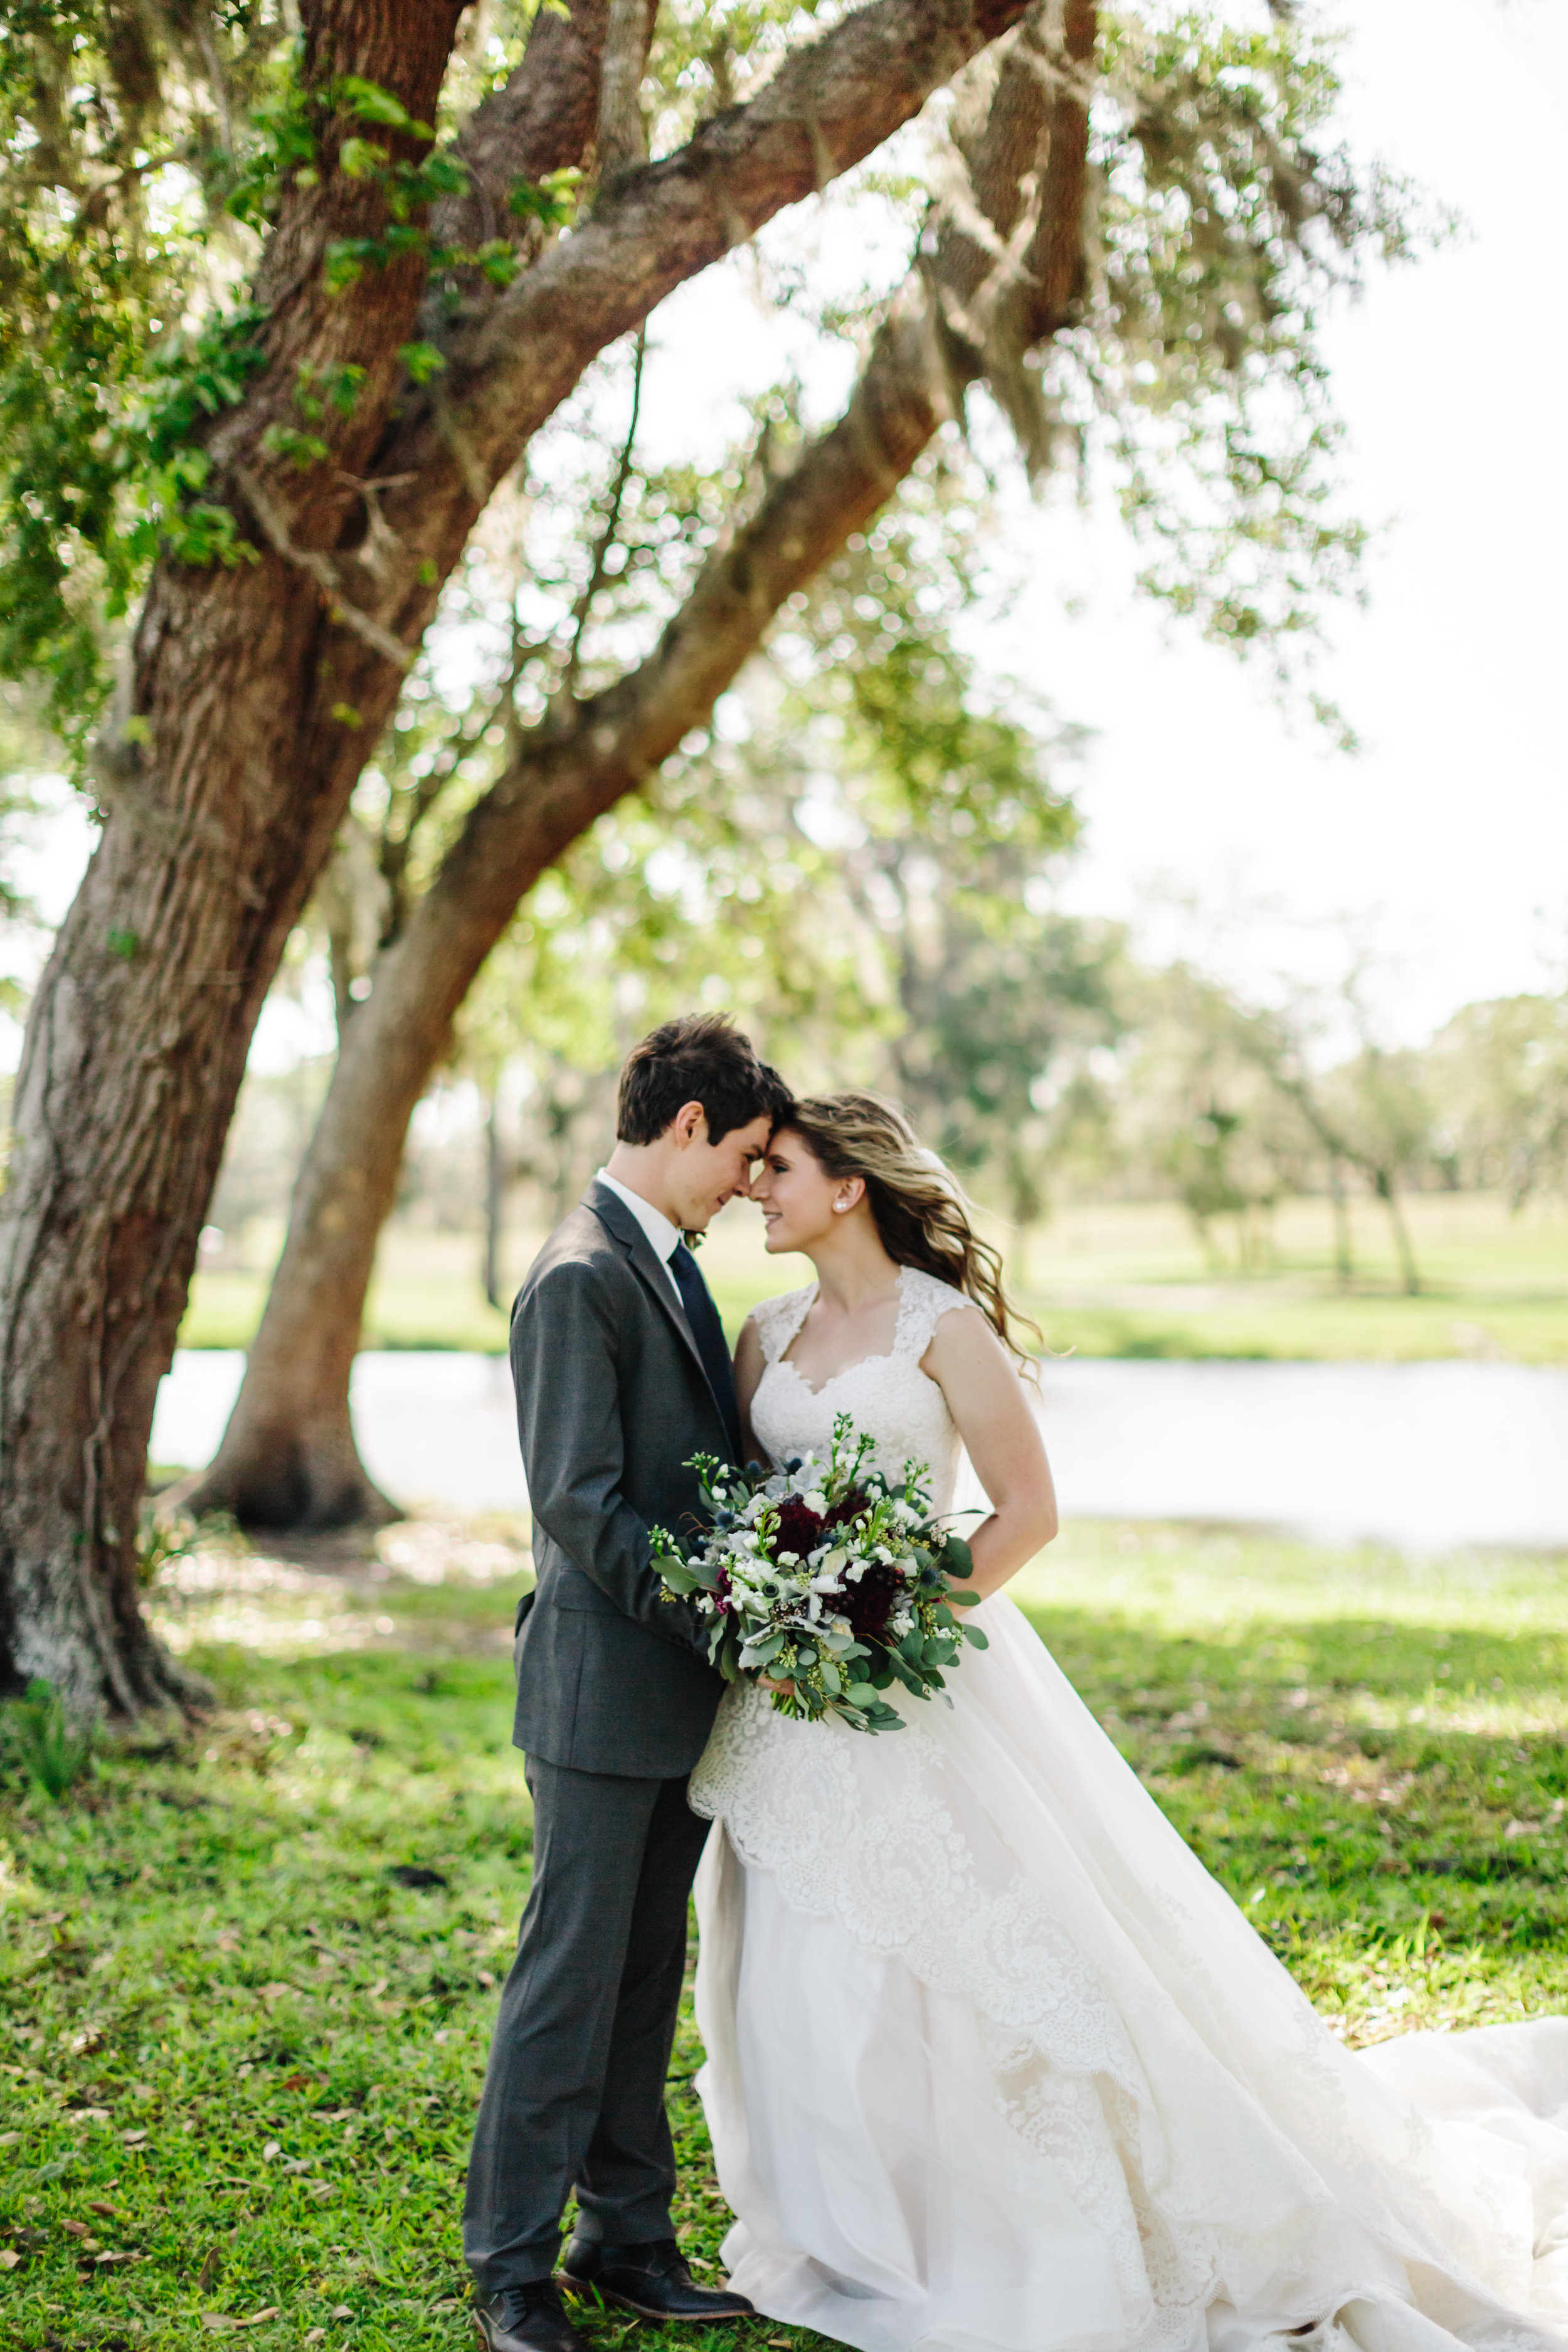 2018.04.14 Zak and Jamisyn Unrue Black Willow Barn Wedding Finals-564.jpg